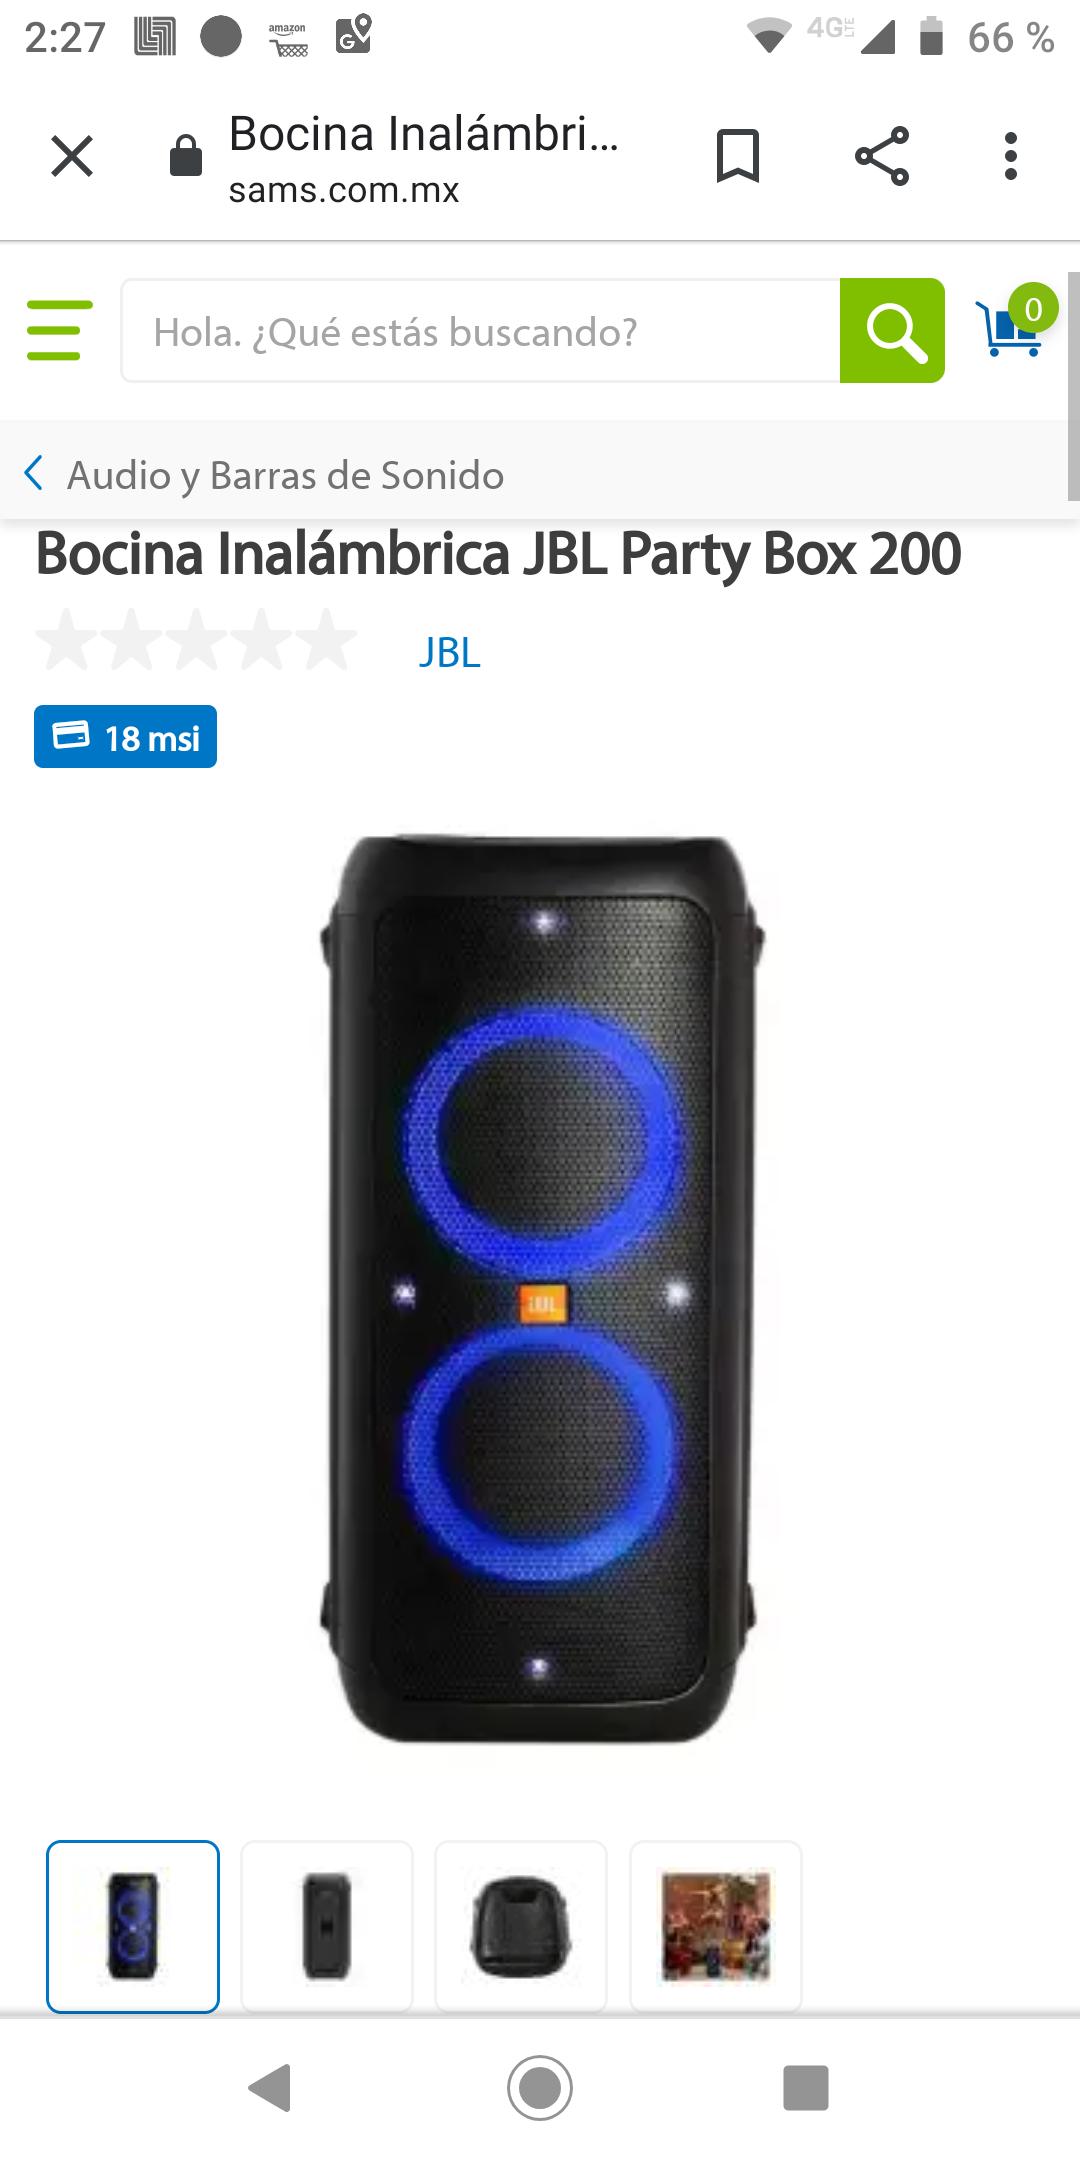 Sam's Club: JBL PARTY BOX 200